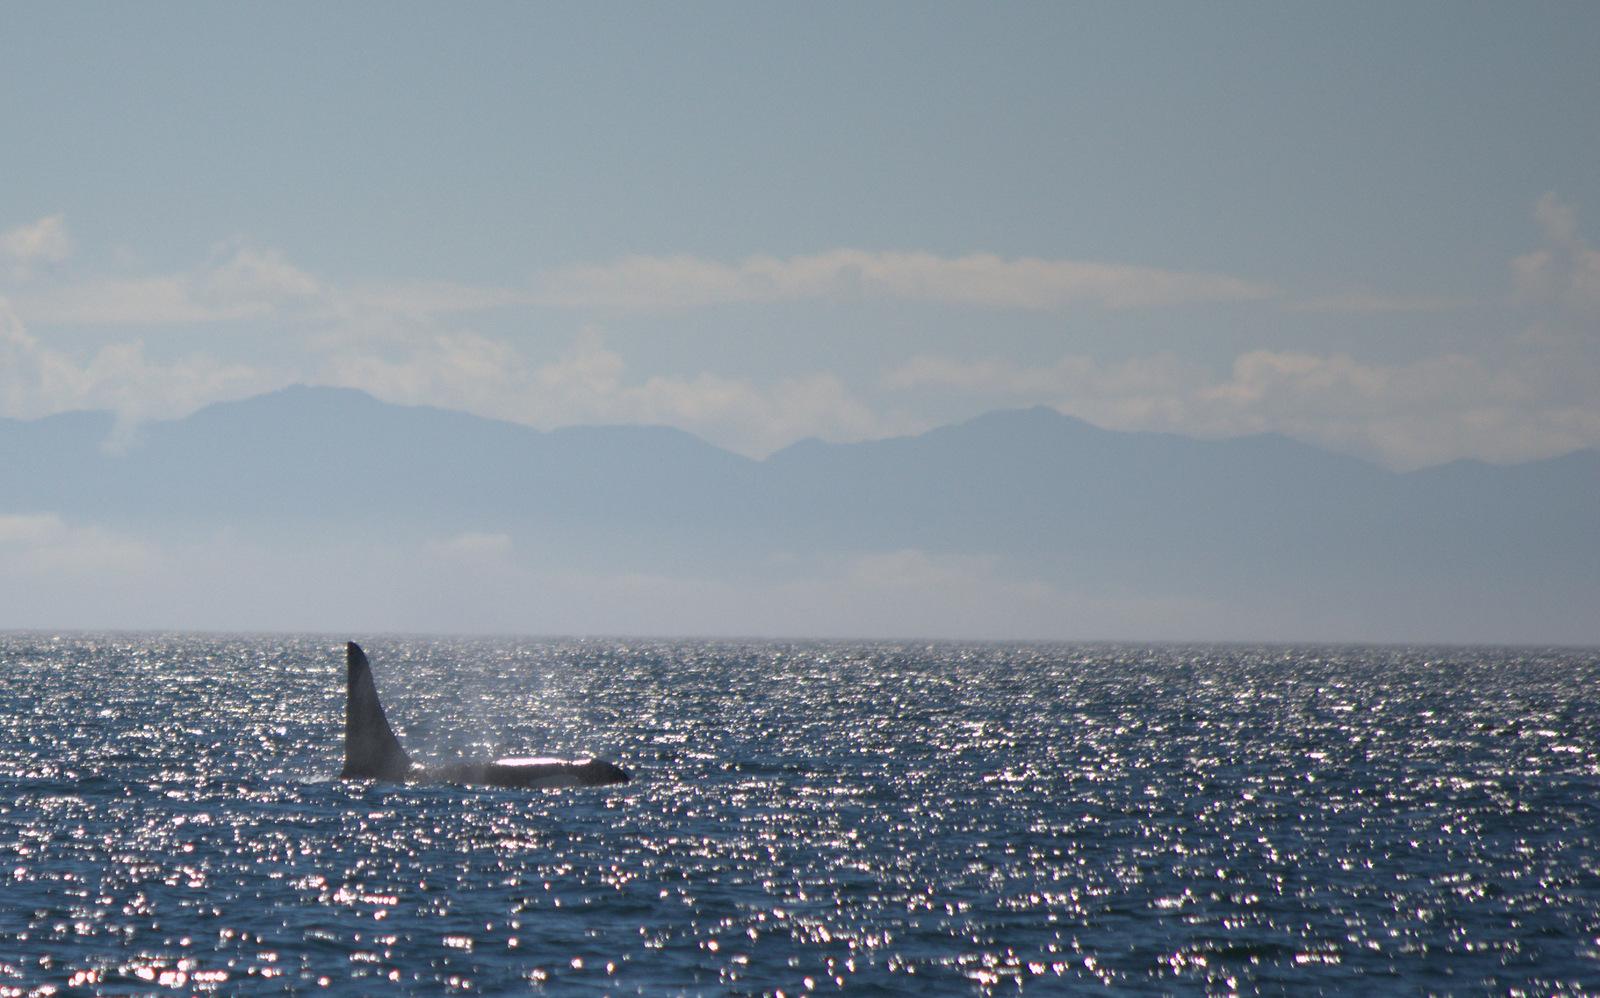 Male killer whale surfacing